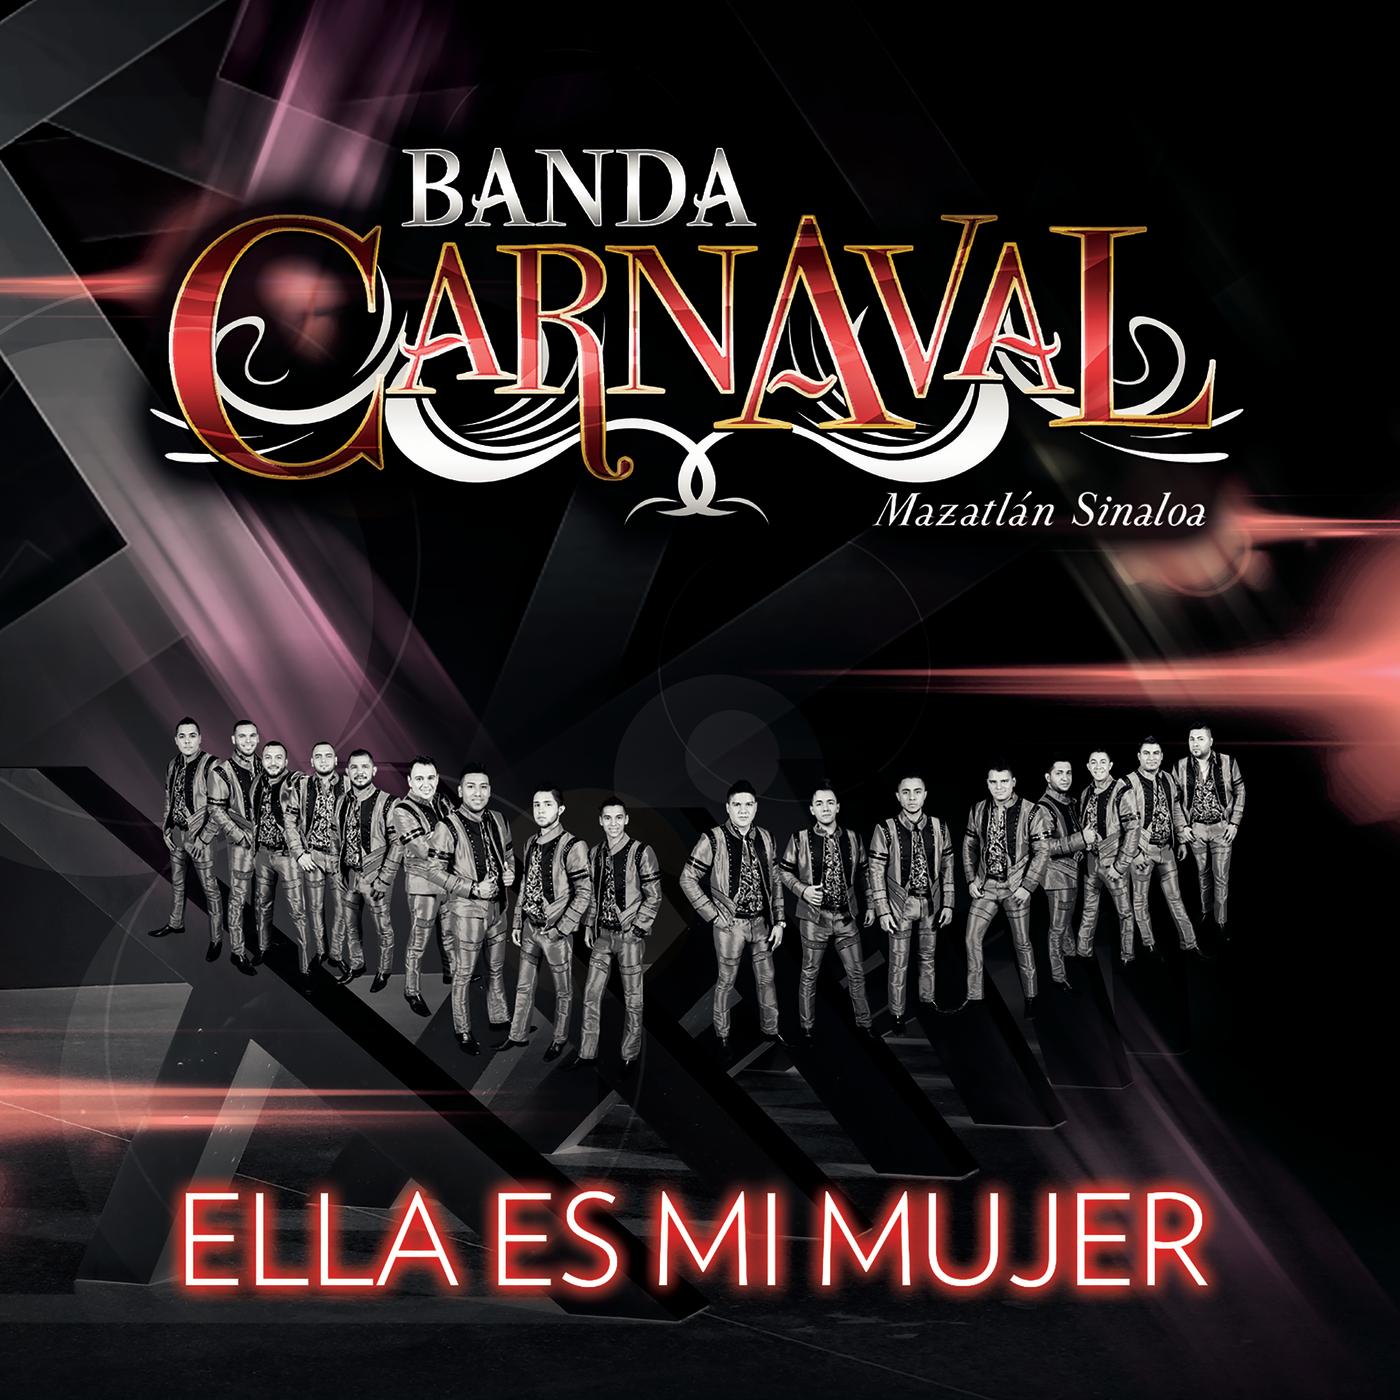 Banda Carnaval Radio Listen To Free Music Get The Latest Info